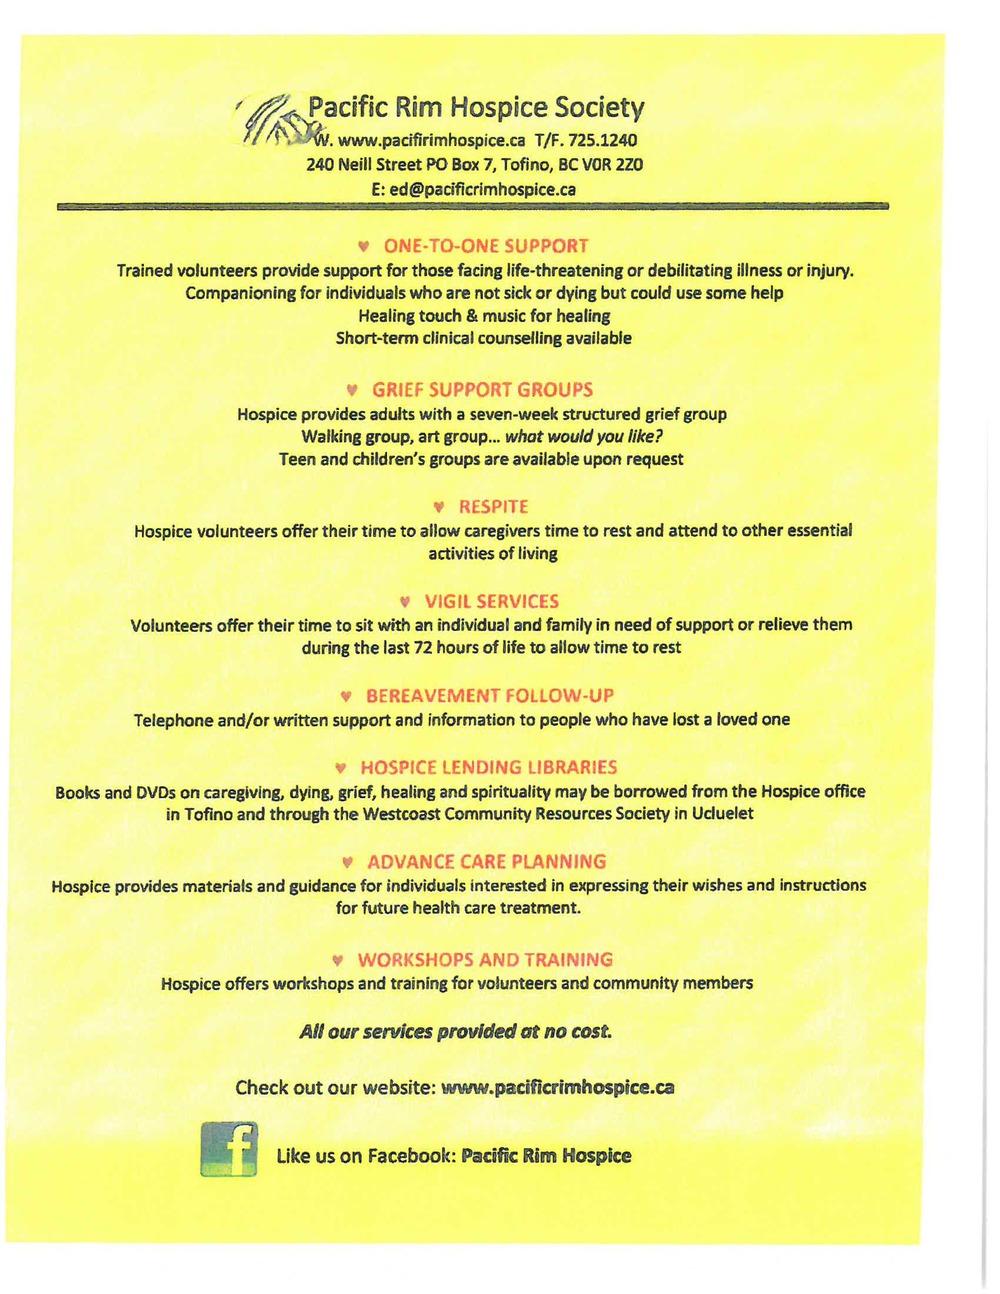 TFN Bulletin Mar 1-2016_Page_15.jpg